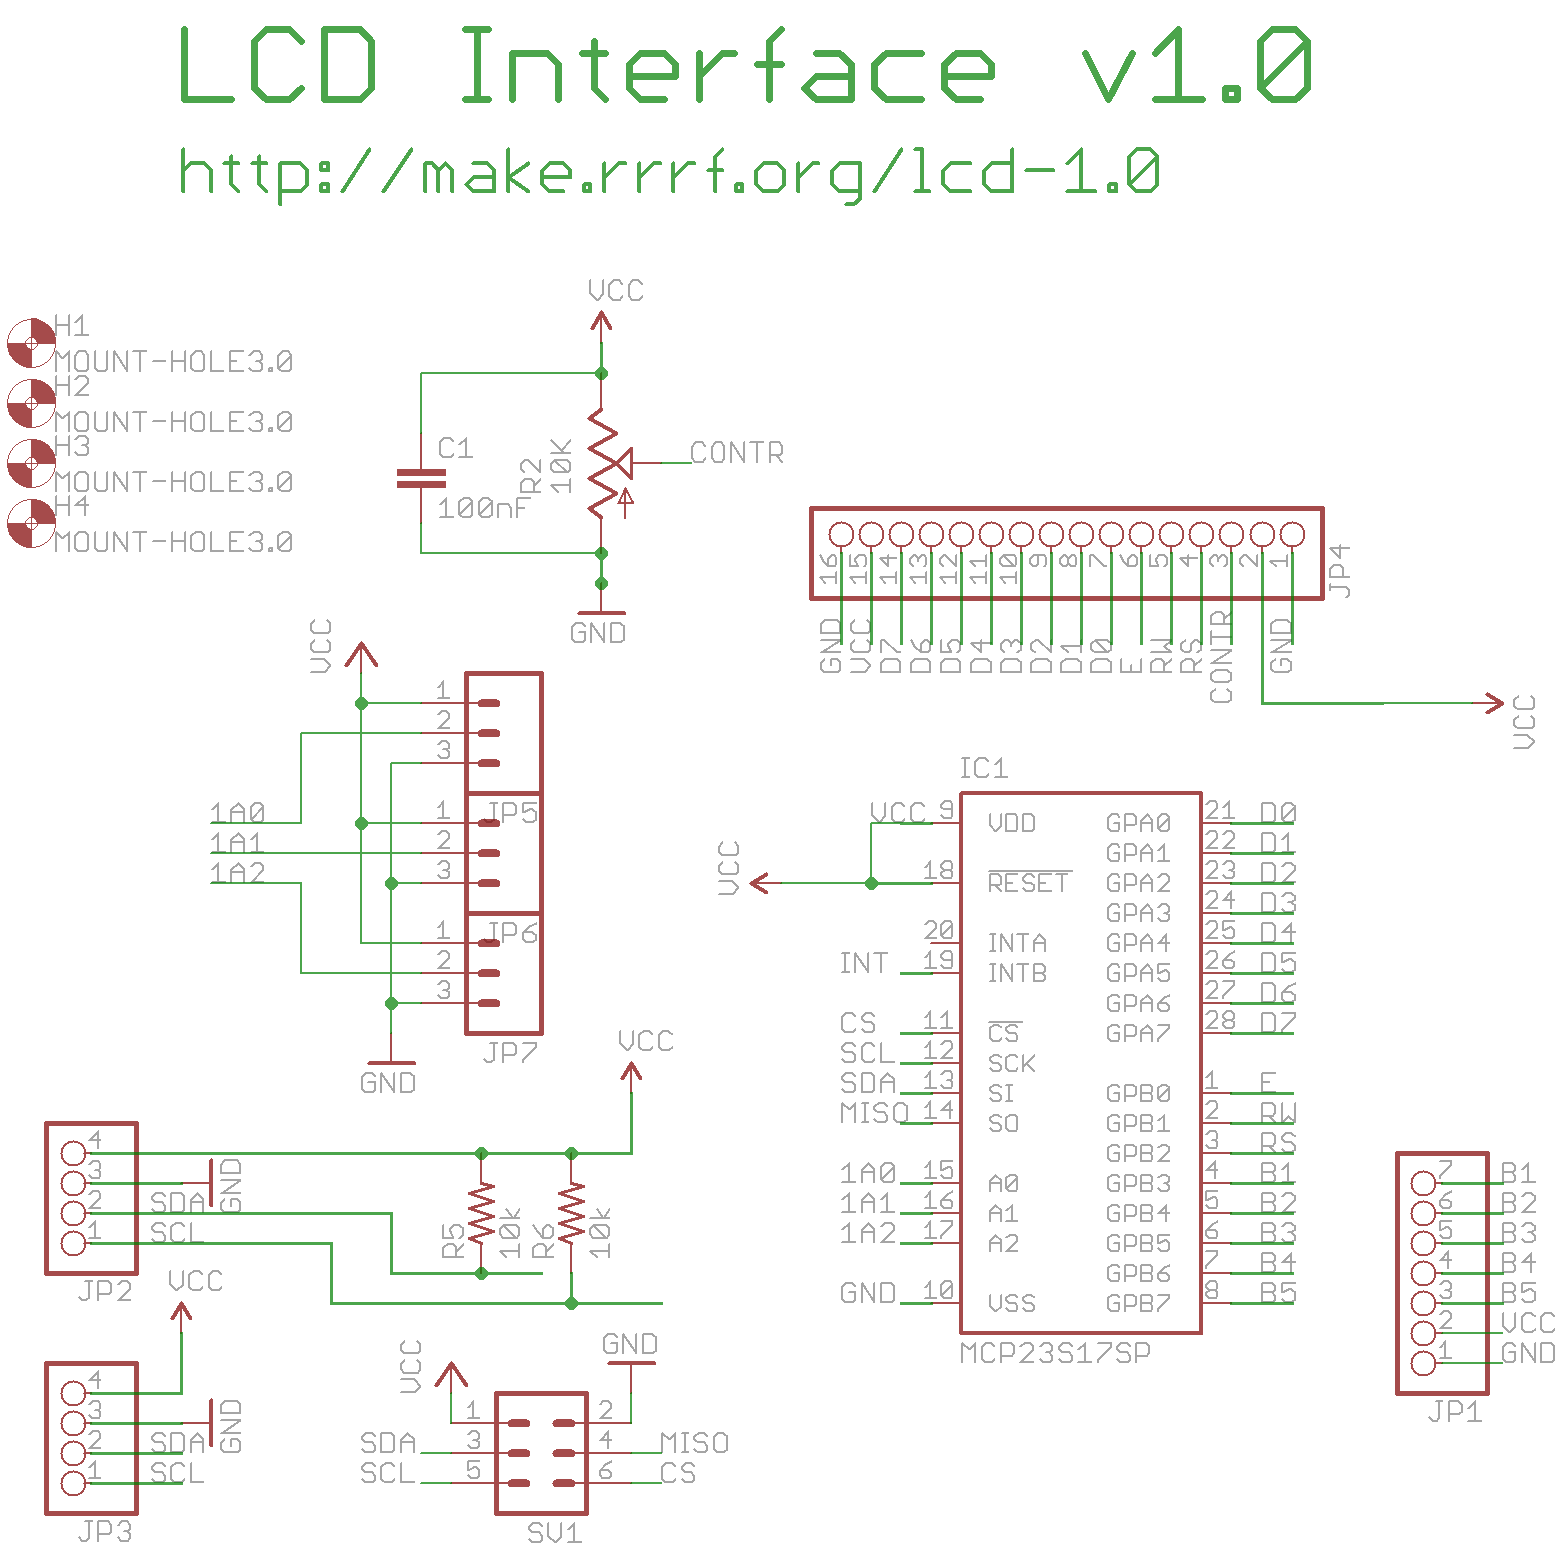 hdmi wiring schematic emulator on hdmi images free download Hdmi Wiring Schematic hdmi wiring schematic emulator 2 hdmi 3d cable 1 4 wiring diagram hdmi to usb schematic hdmi wiring schematic